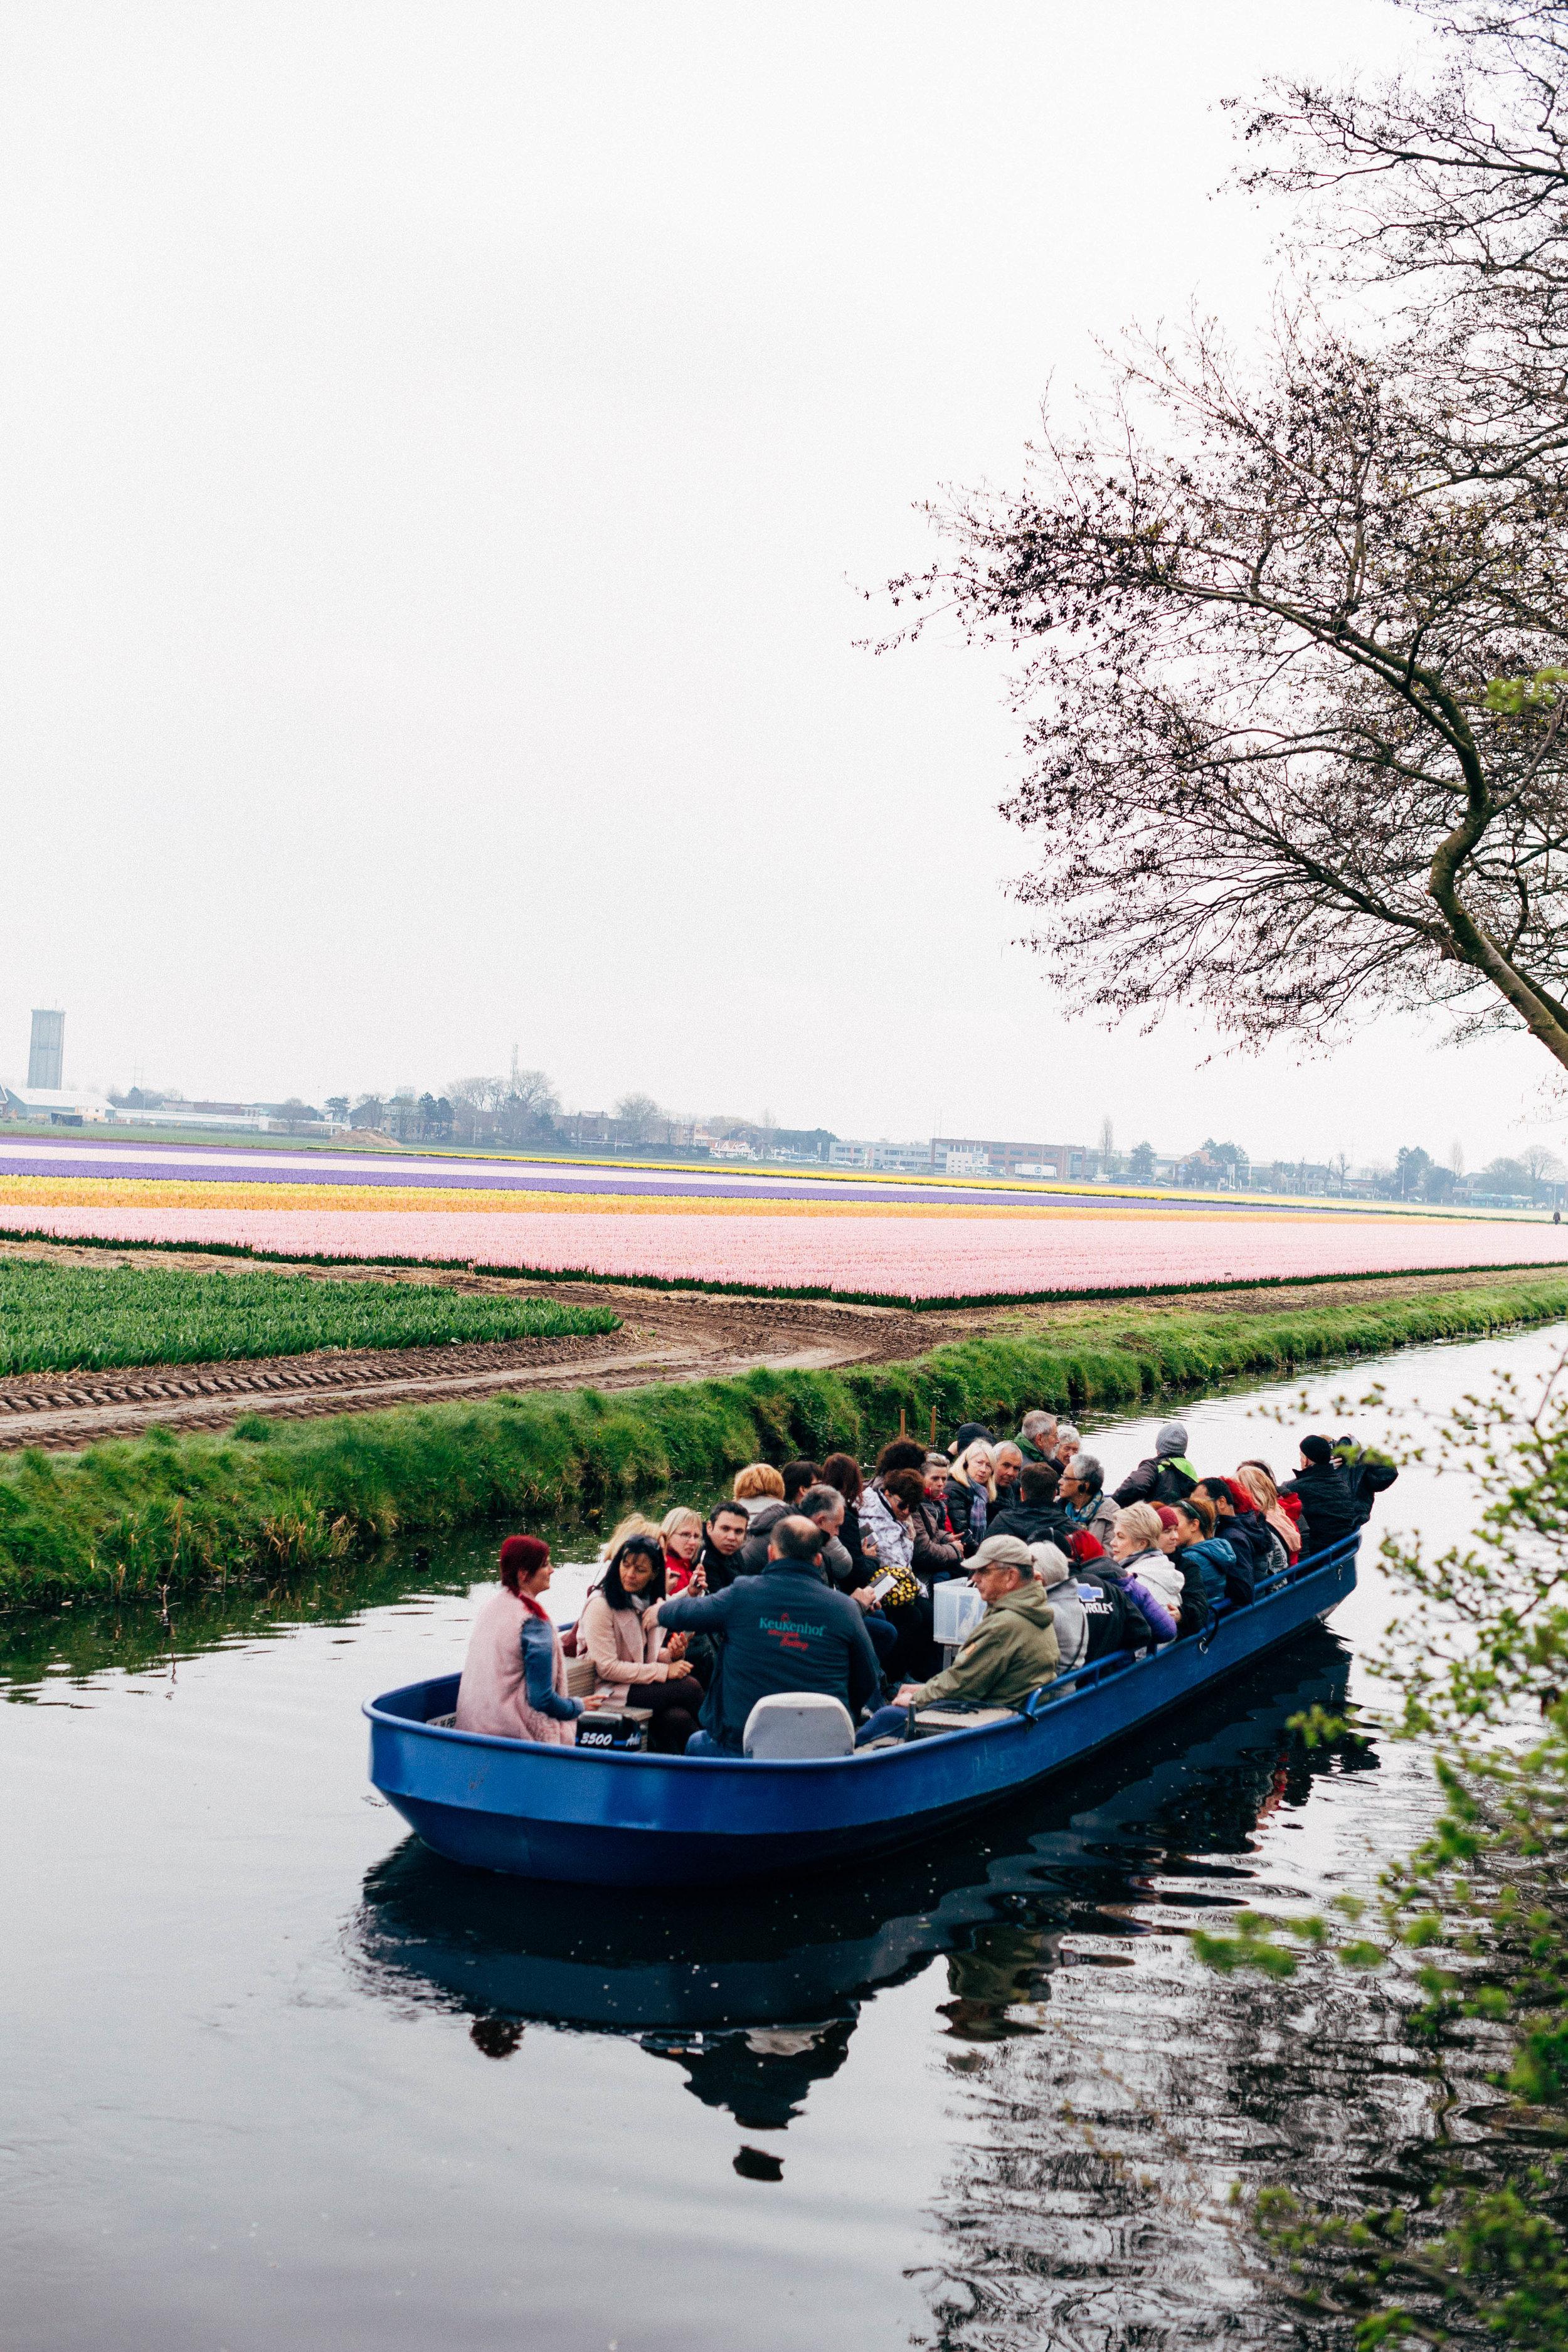 people-canal-boat-keukenhof